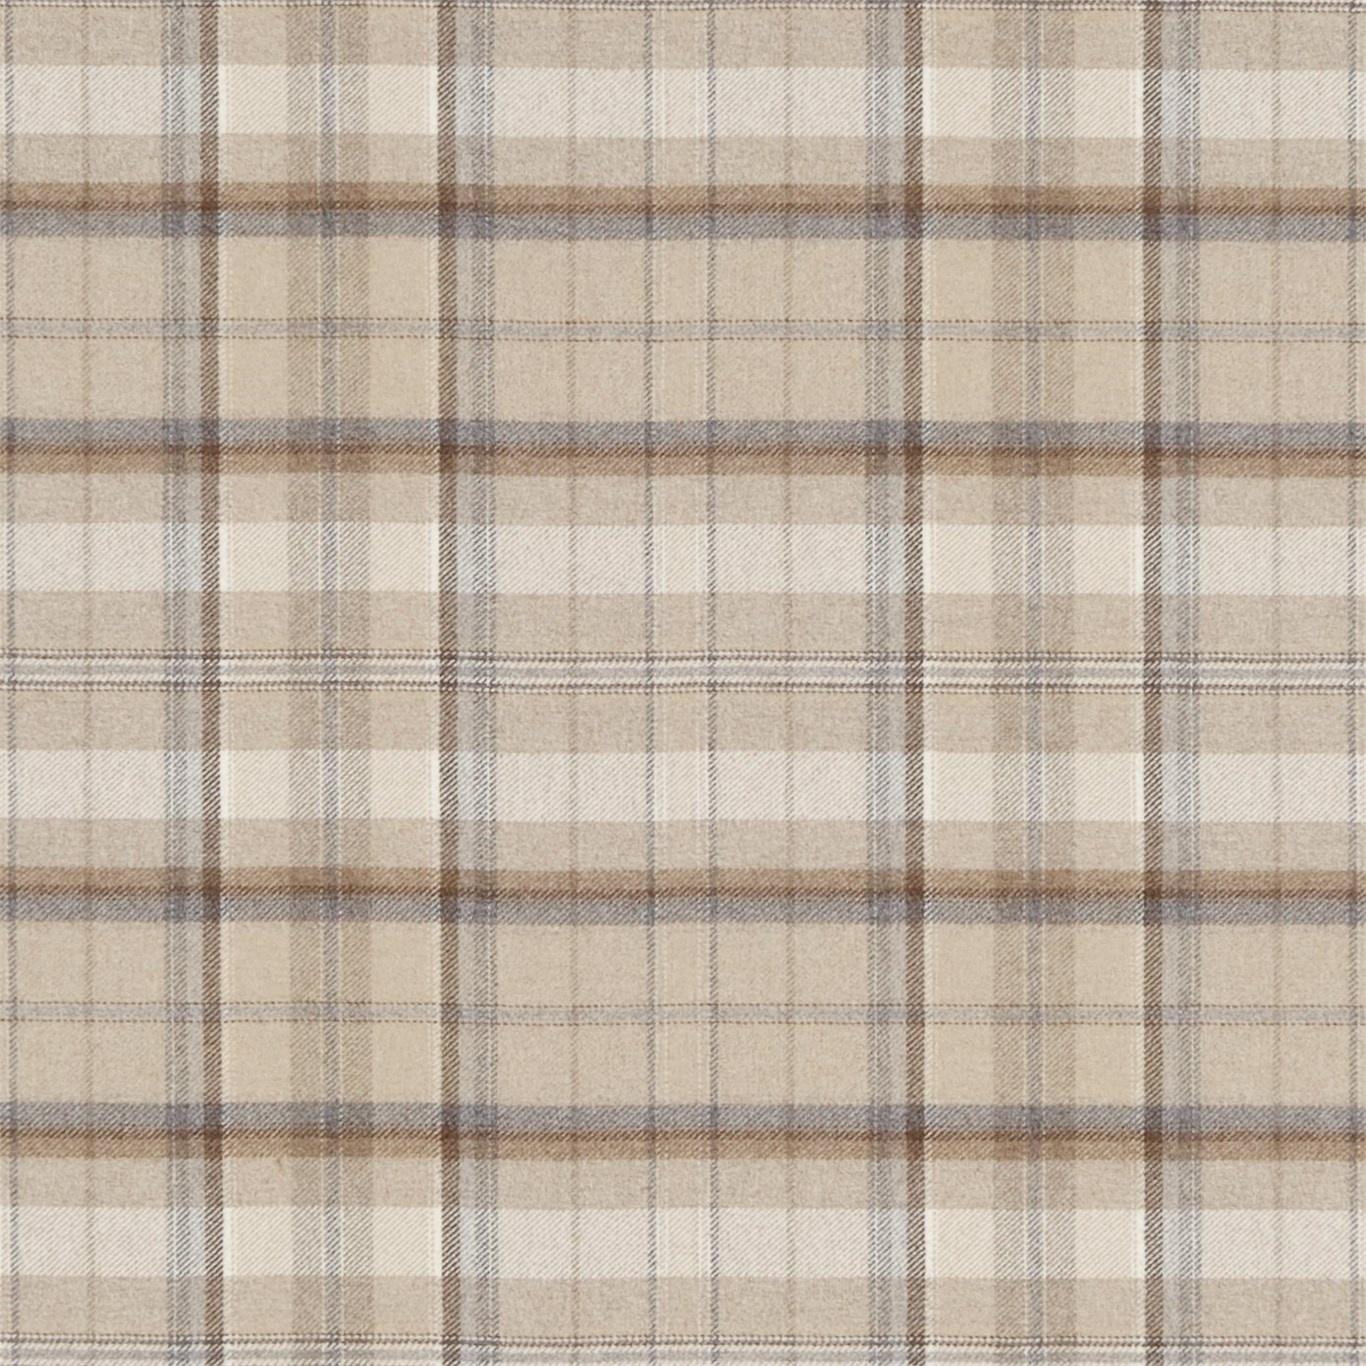 Image of Sanderson Byron Linen/Pebble Fabric 233241